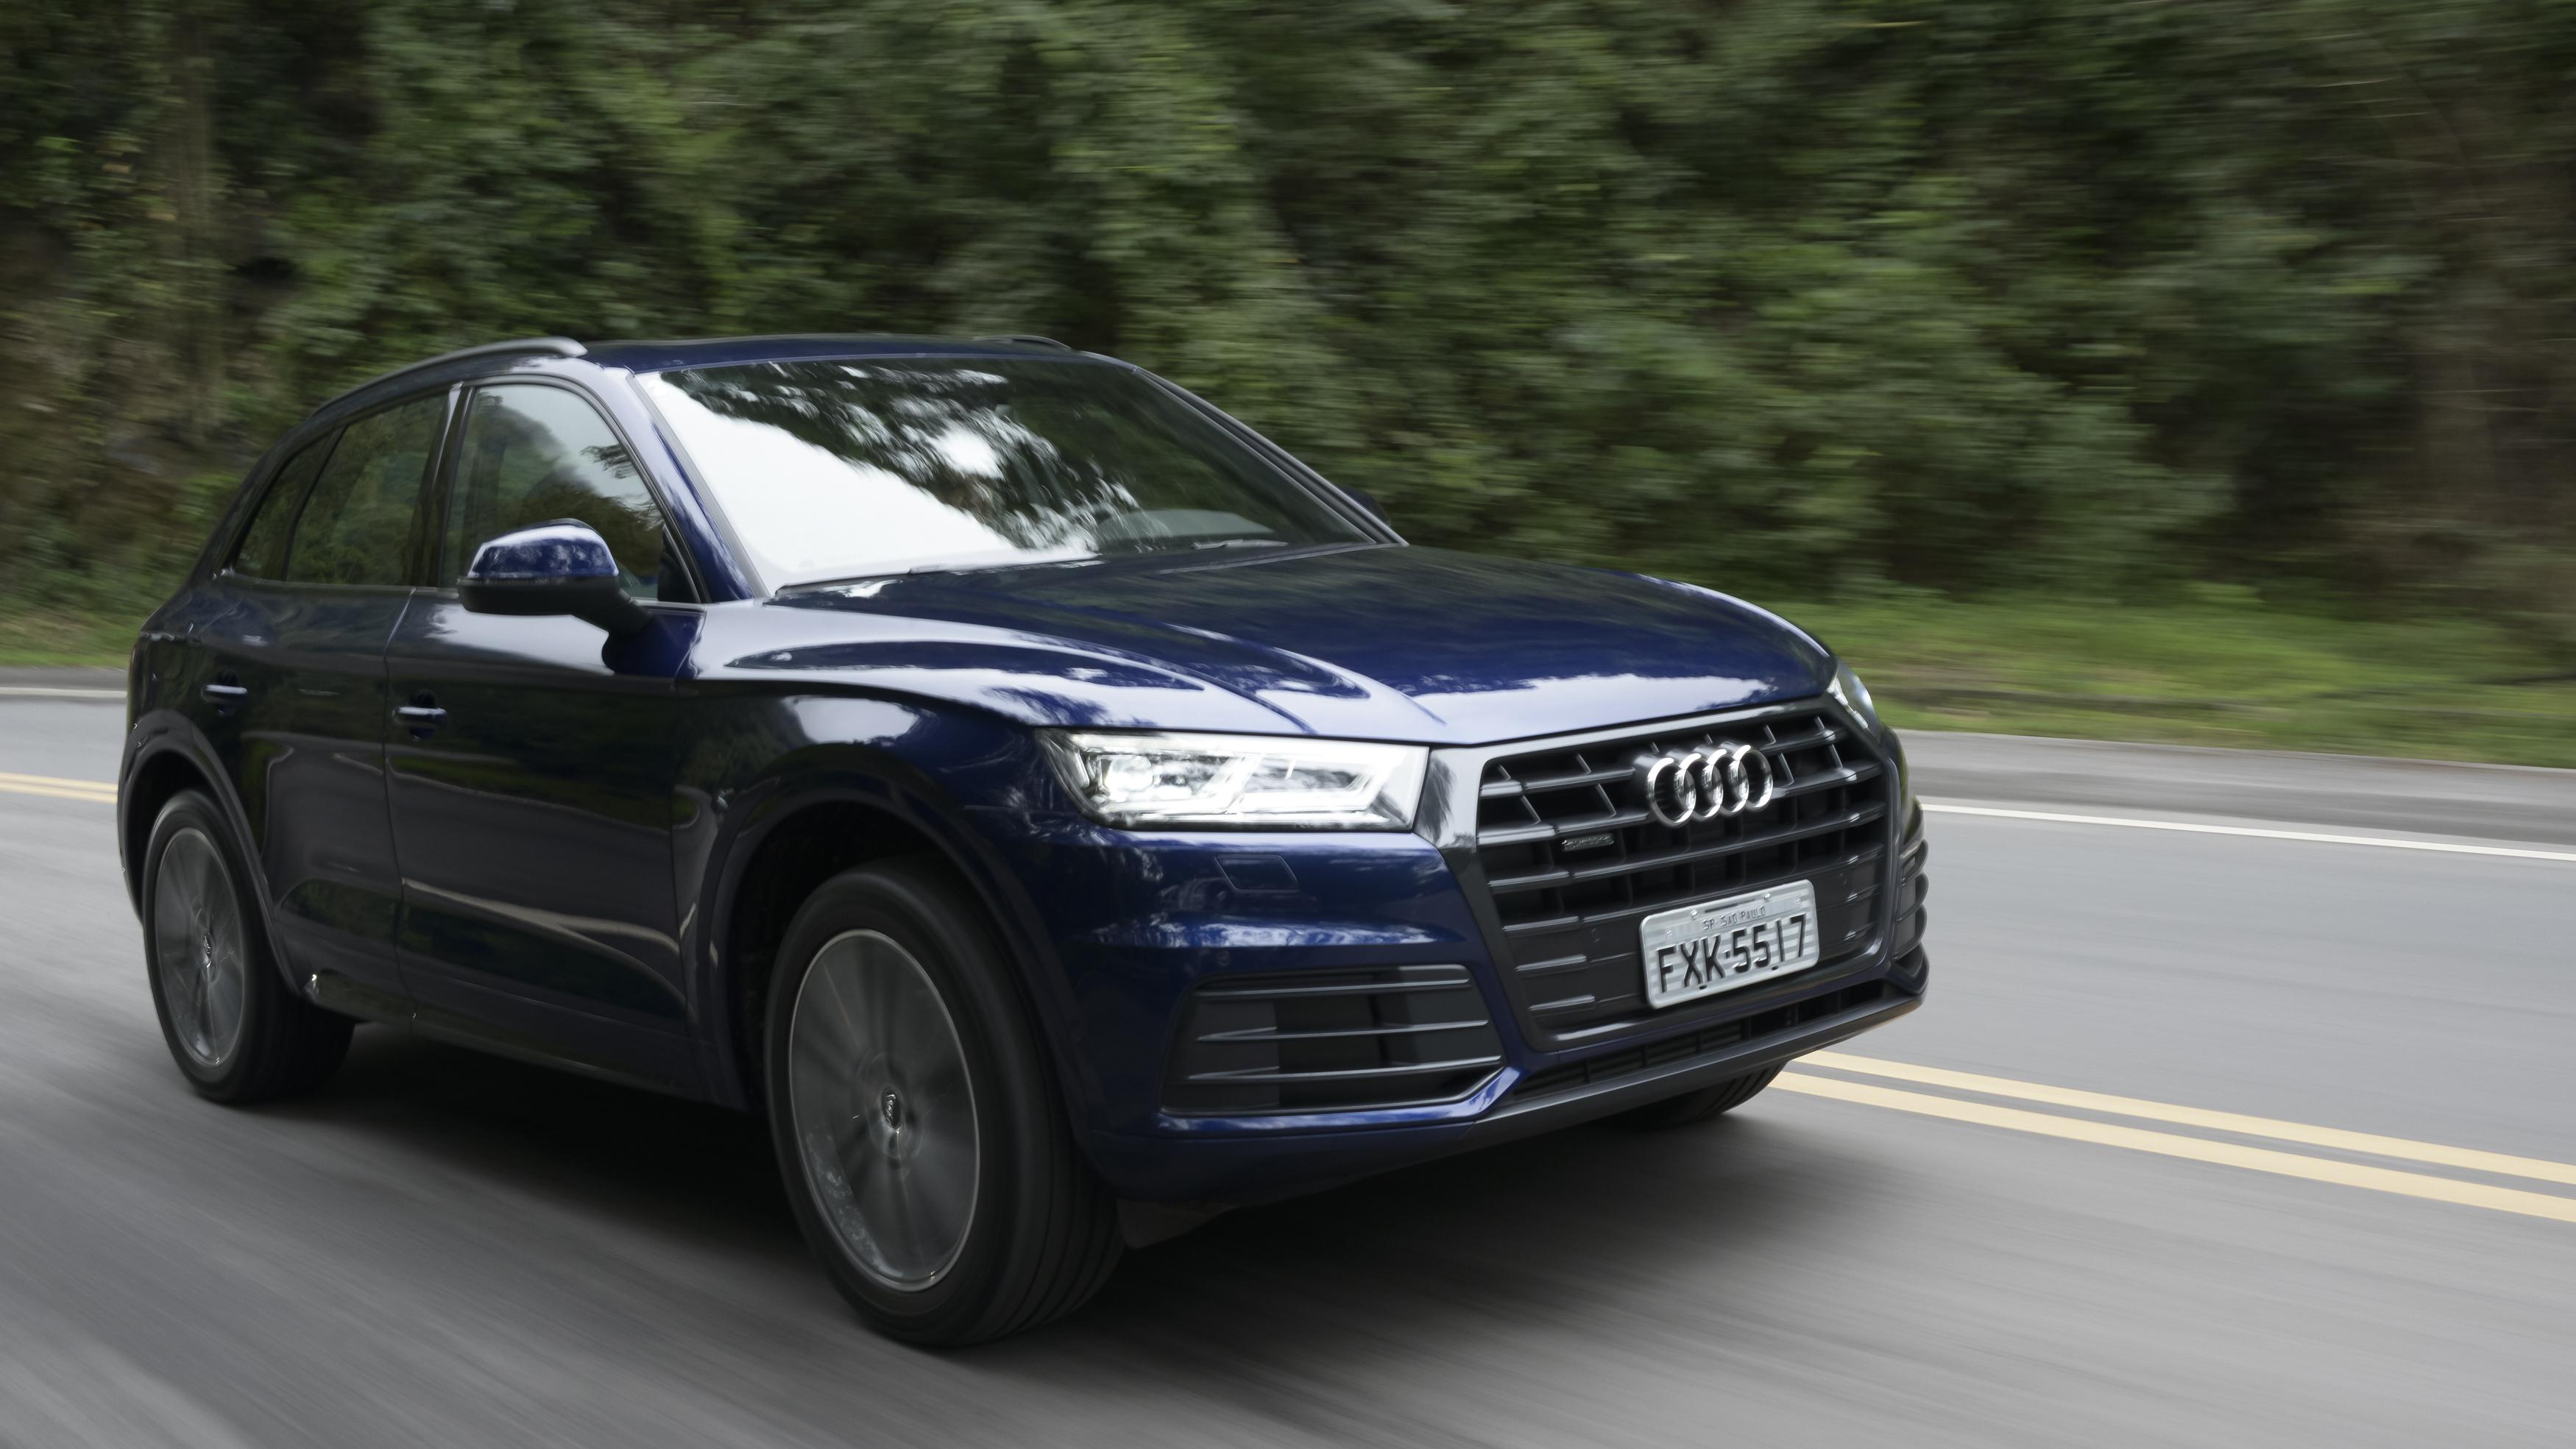 Audi Q5 à prova de fogo